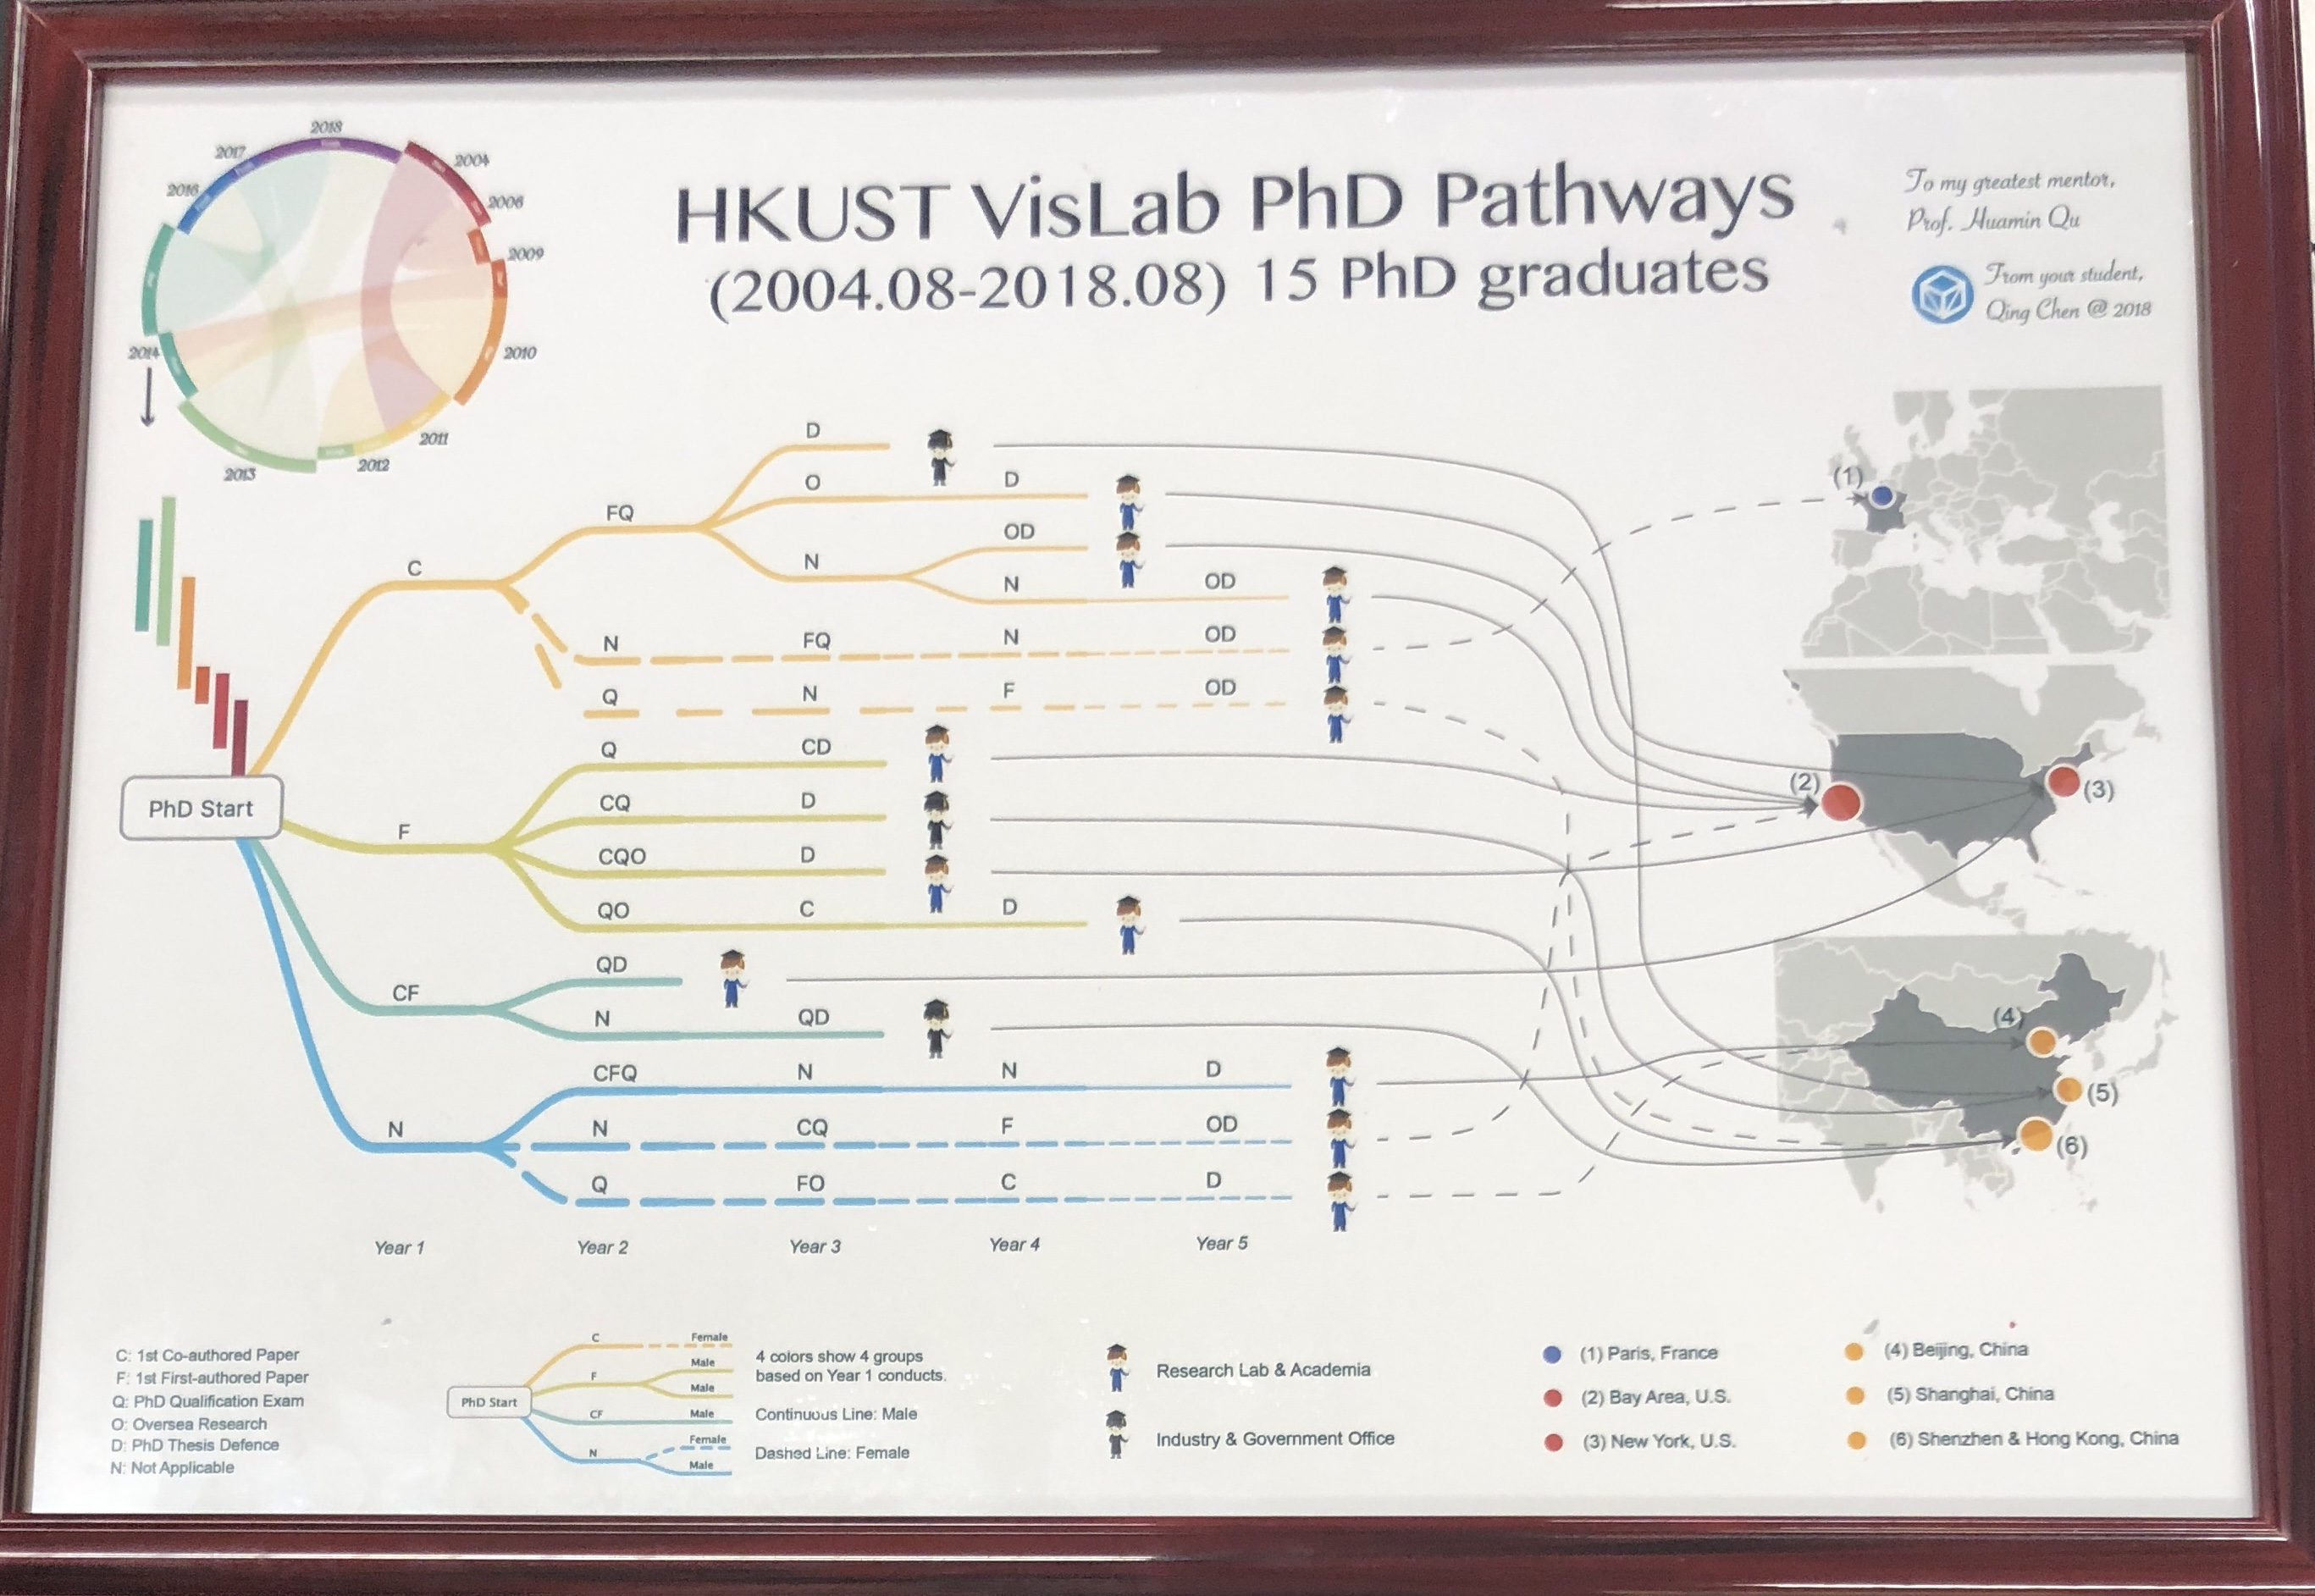 vislab_PhD_pathway.jpg